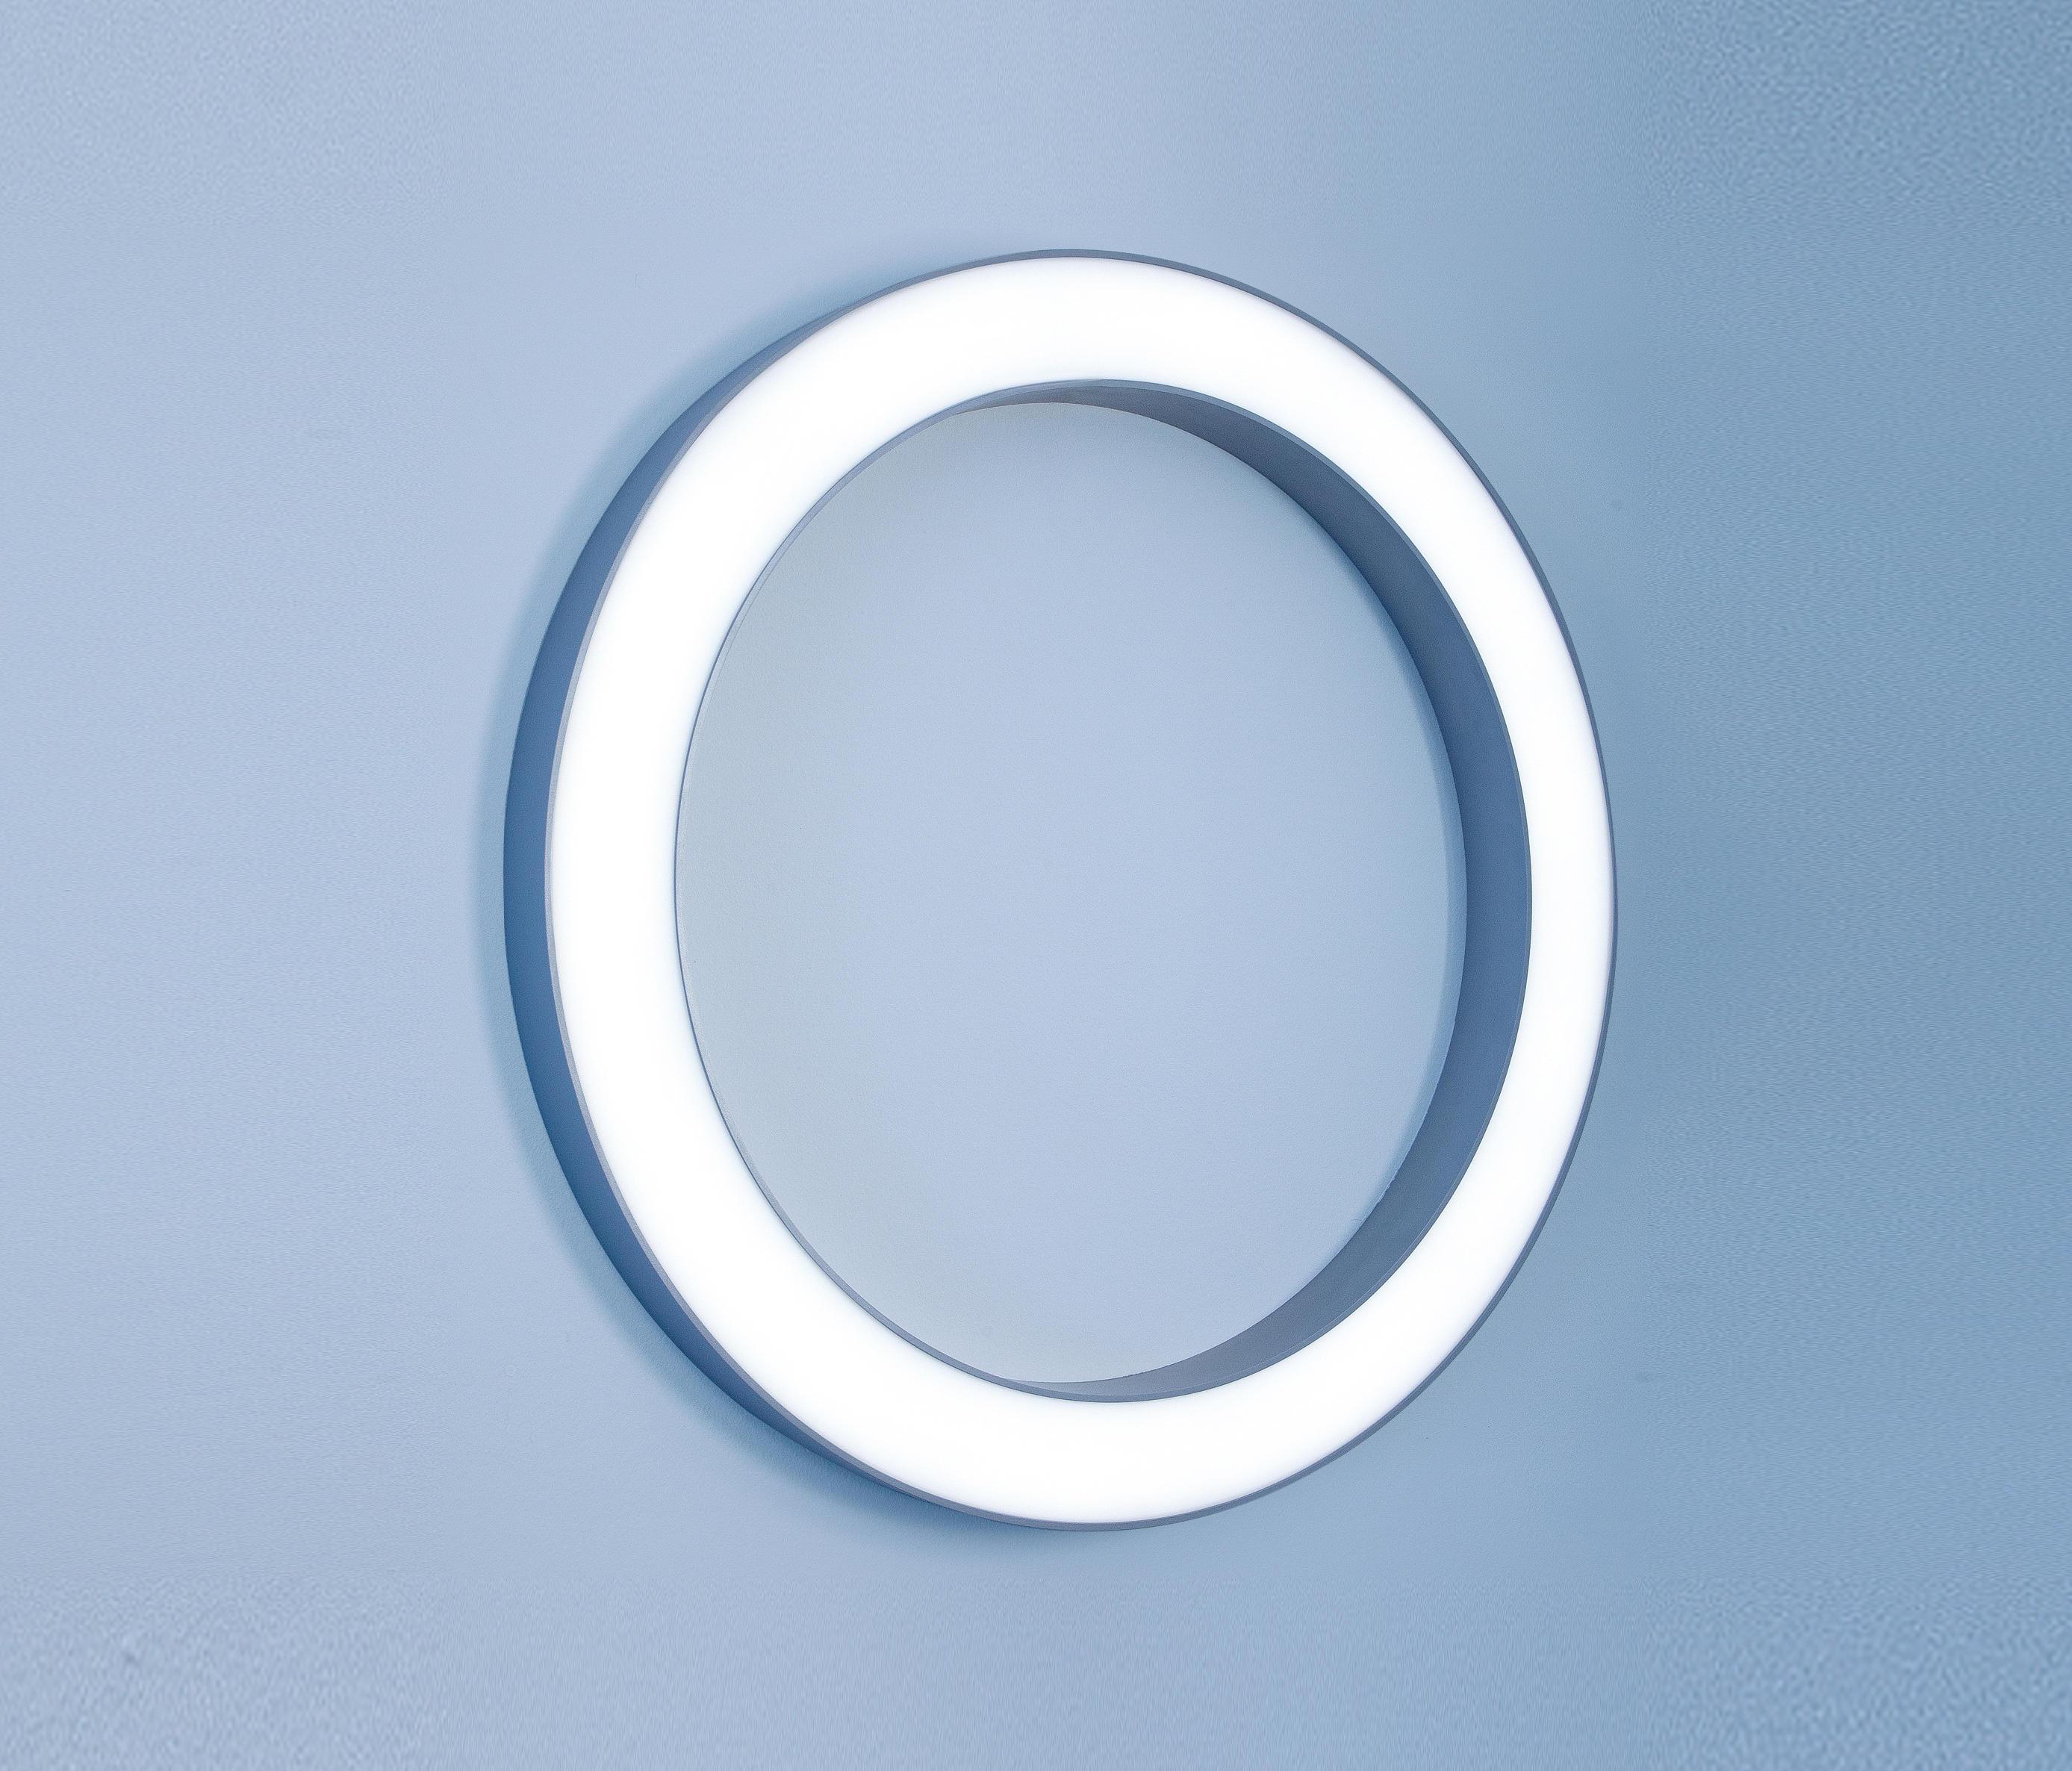 ringo star a1 w clairage g n ral de lightnet architonic. Black Bedroom Furniture Sets. Home Design Ideas